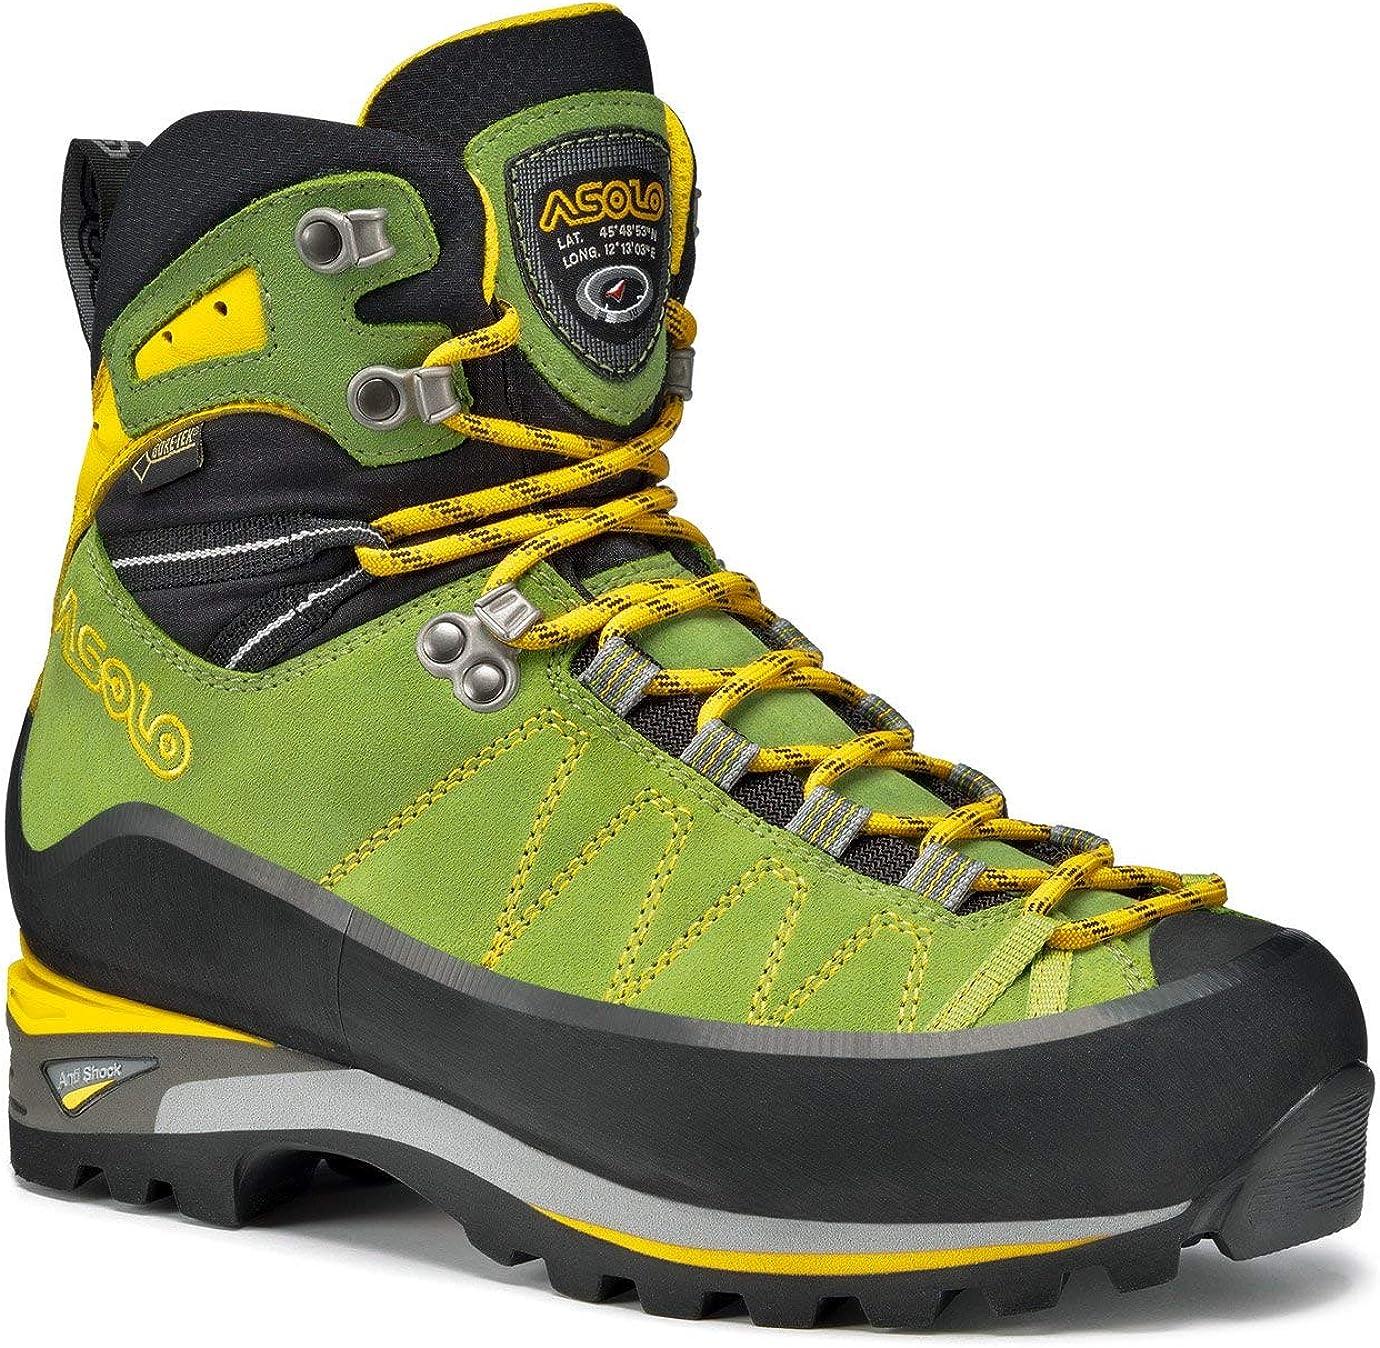 Asolo Women's Elbrus GV Climbing Boot & Knit Cap Bundle